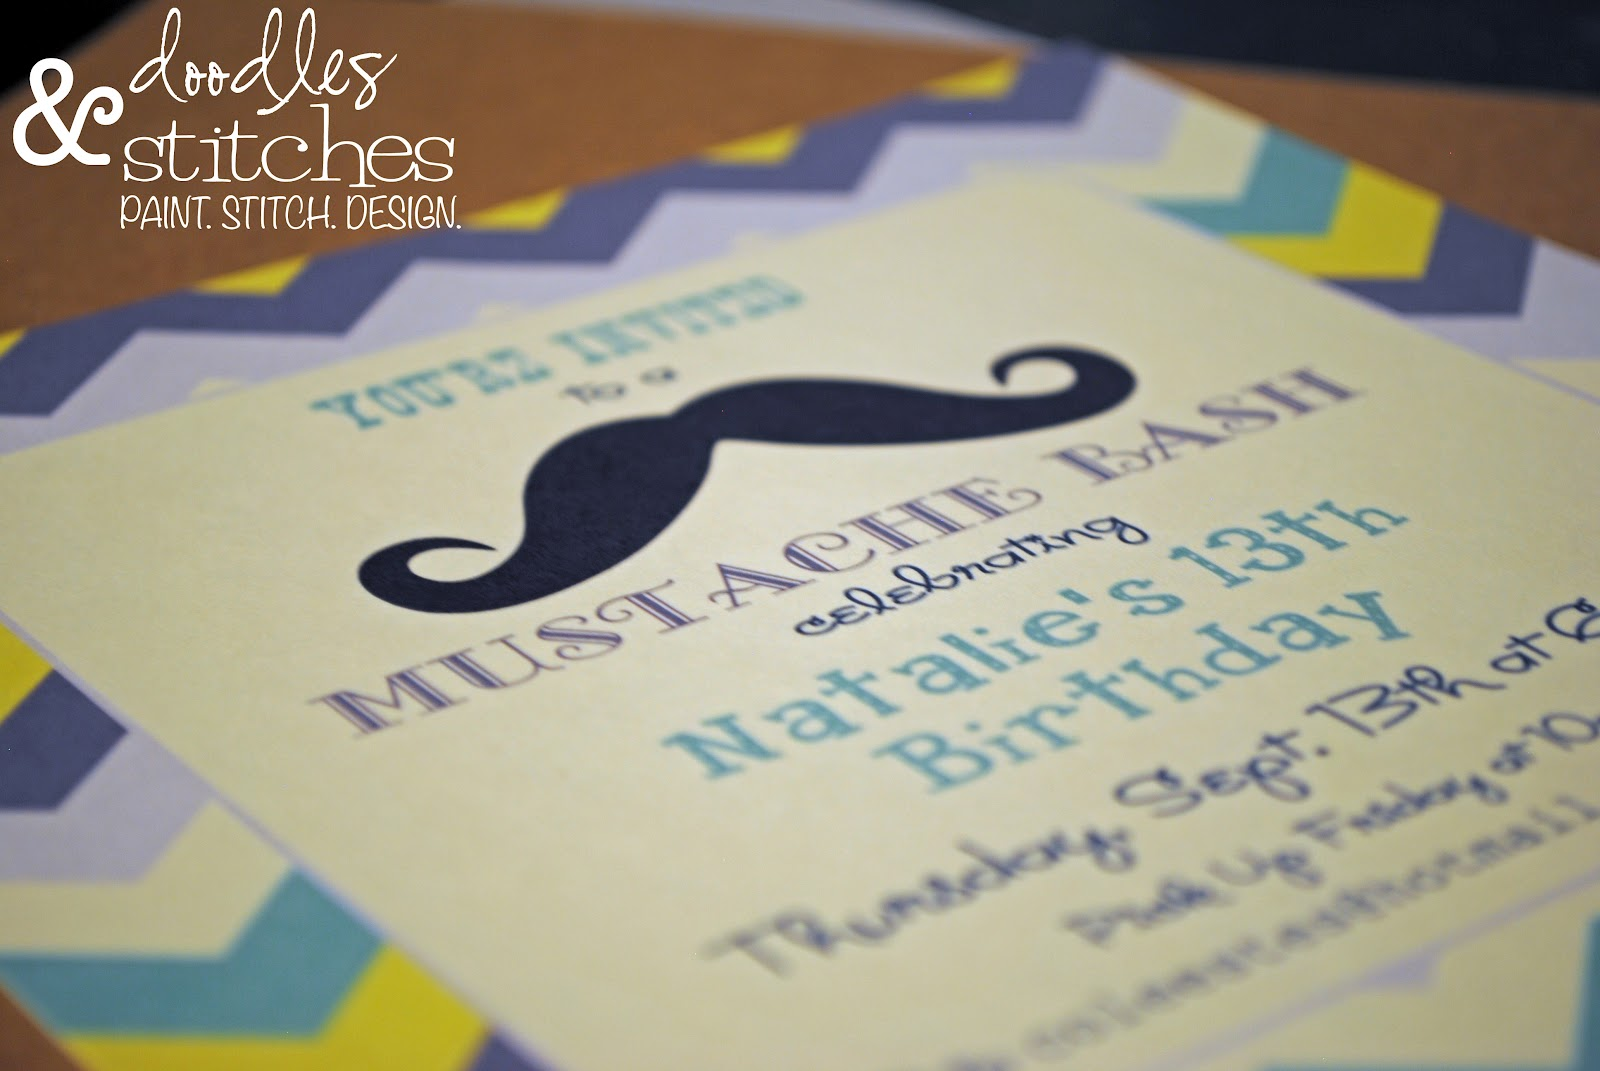 Mustache Bash Party Invitations - Doodles & Stitches